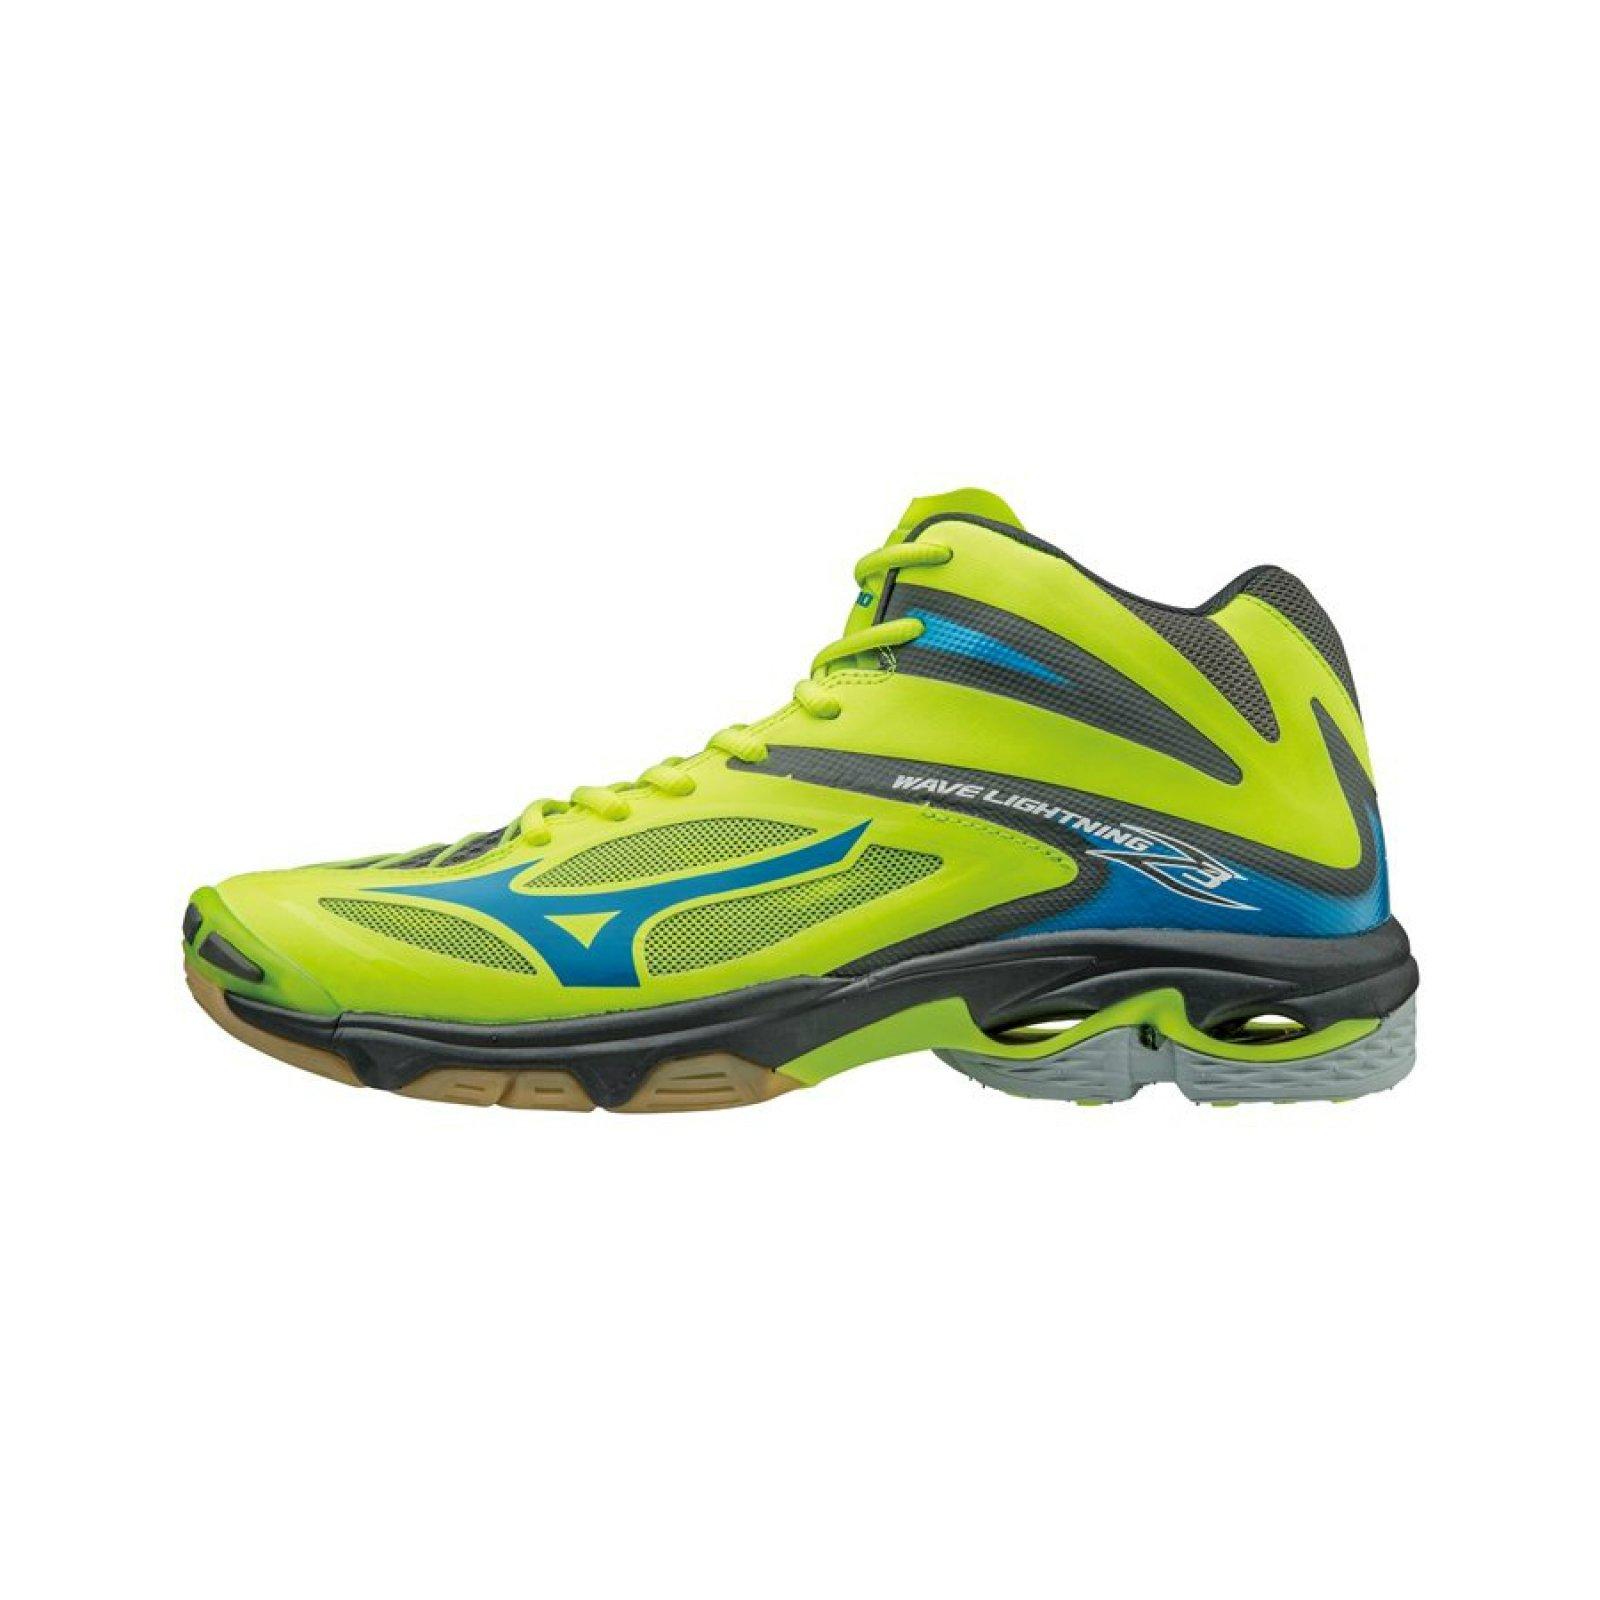 031ff14642bf3 Volejbalové boty Mizuno Wave Lightning Z3 Mid M V1GA170522 ...